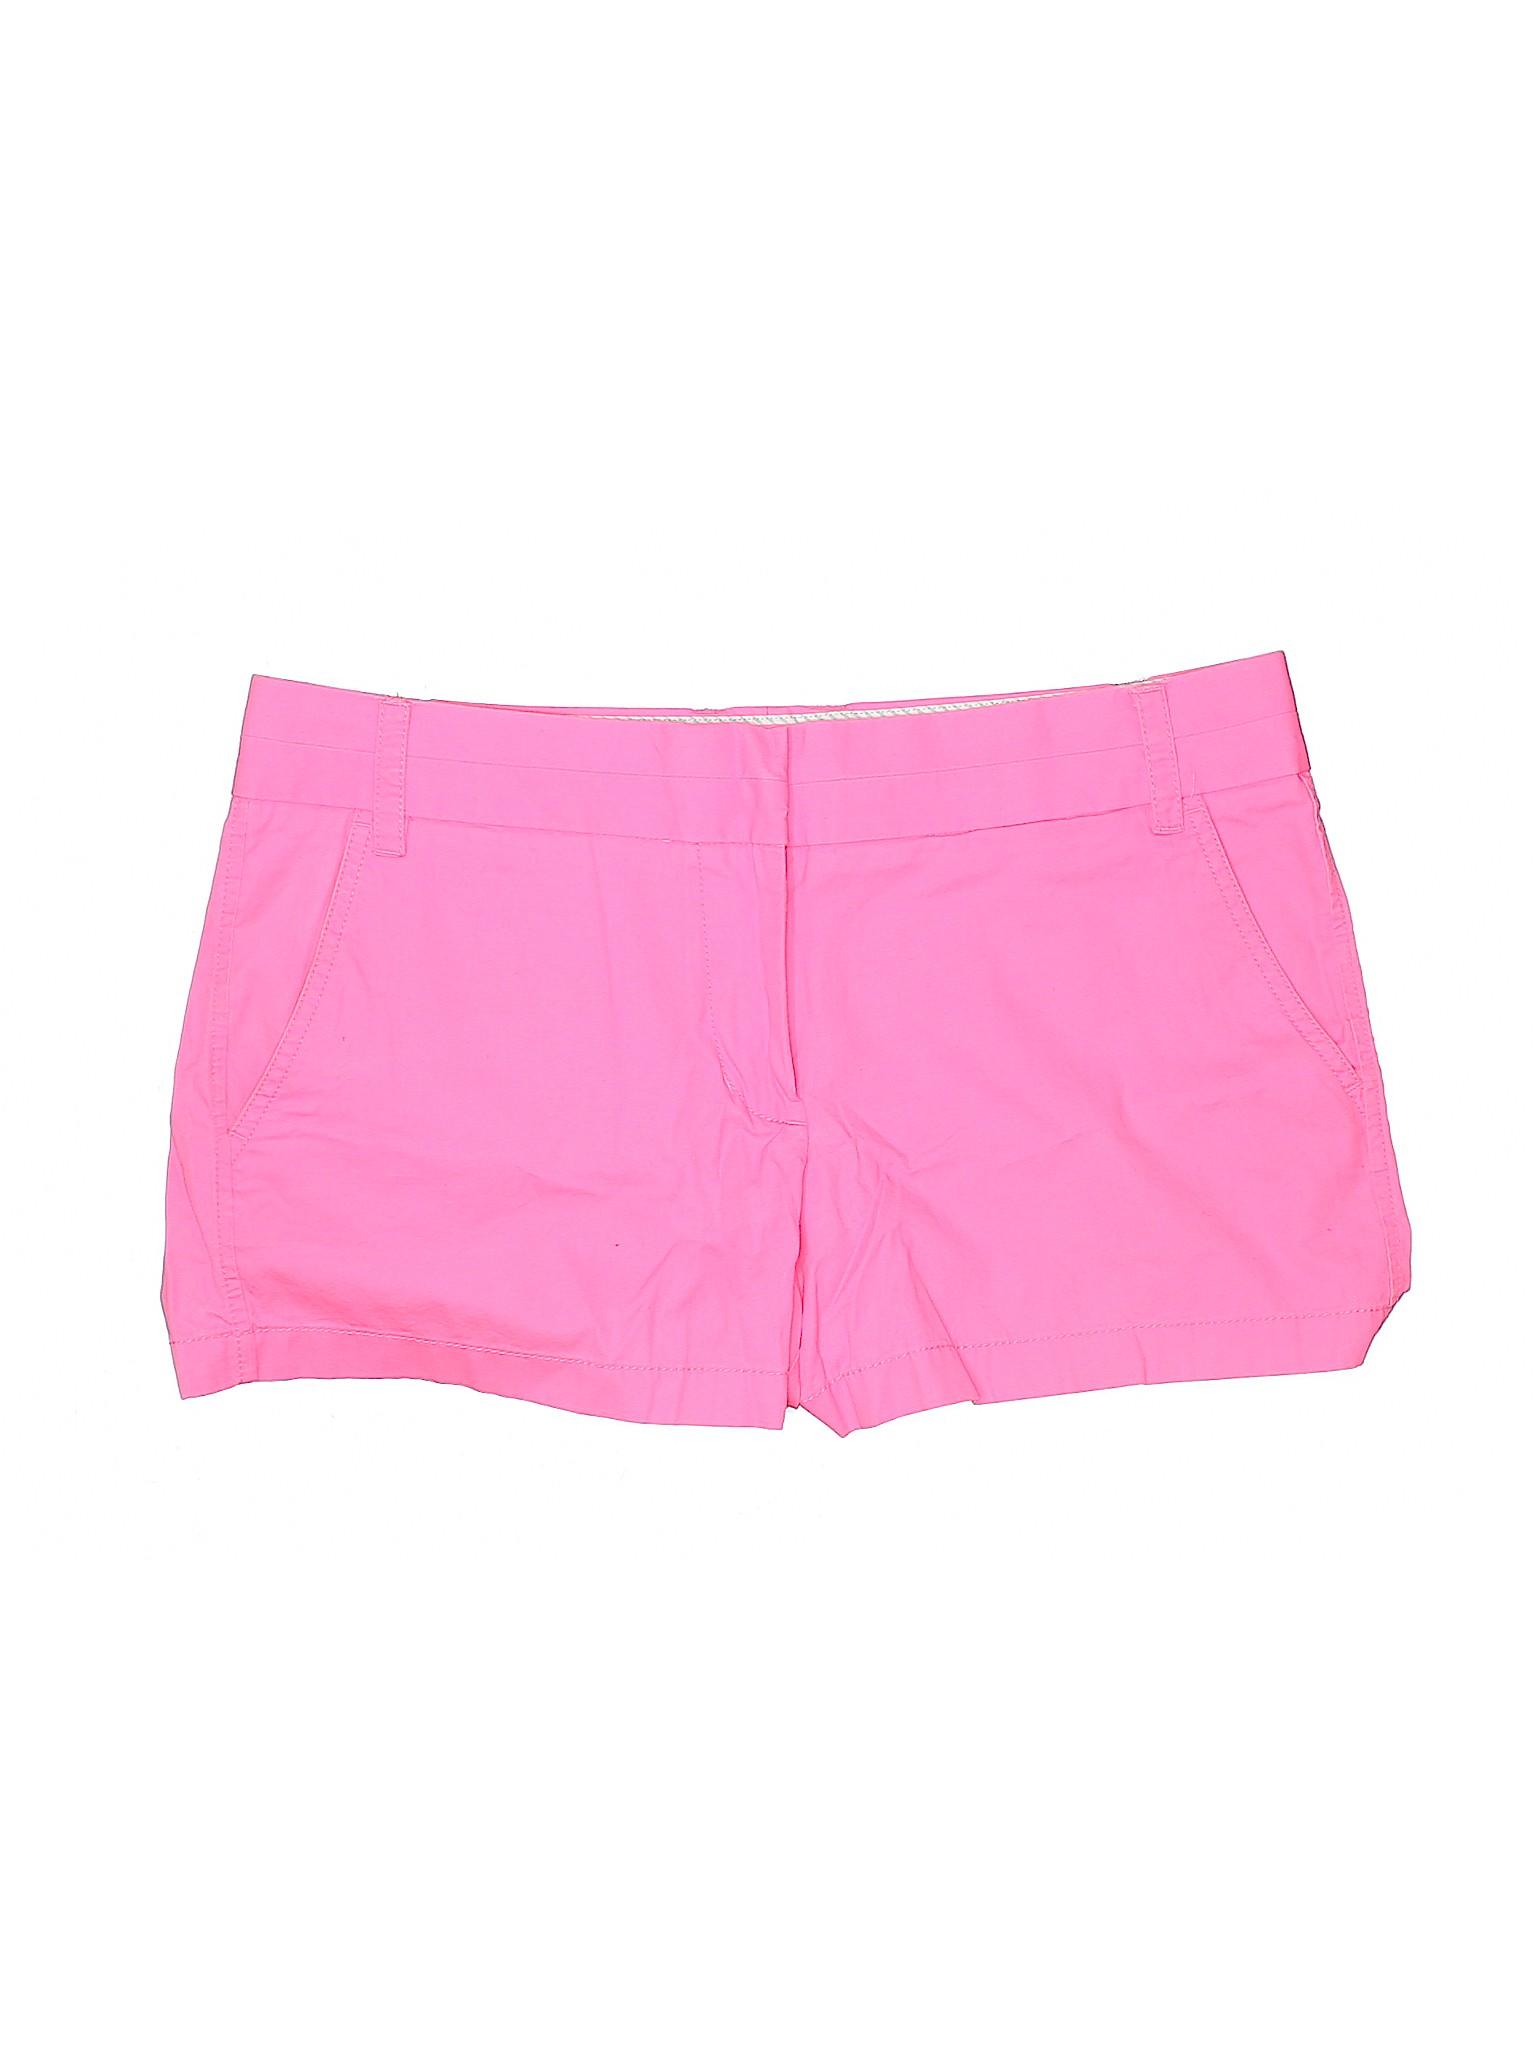 J Khaki Khaki J Boutique Crew Shorts Boutique Shorts Crew w0Atqt